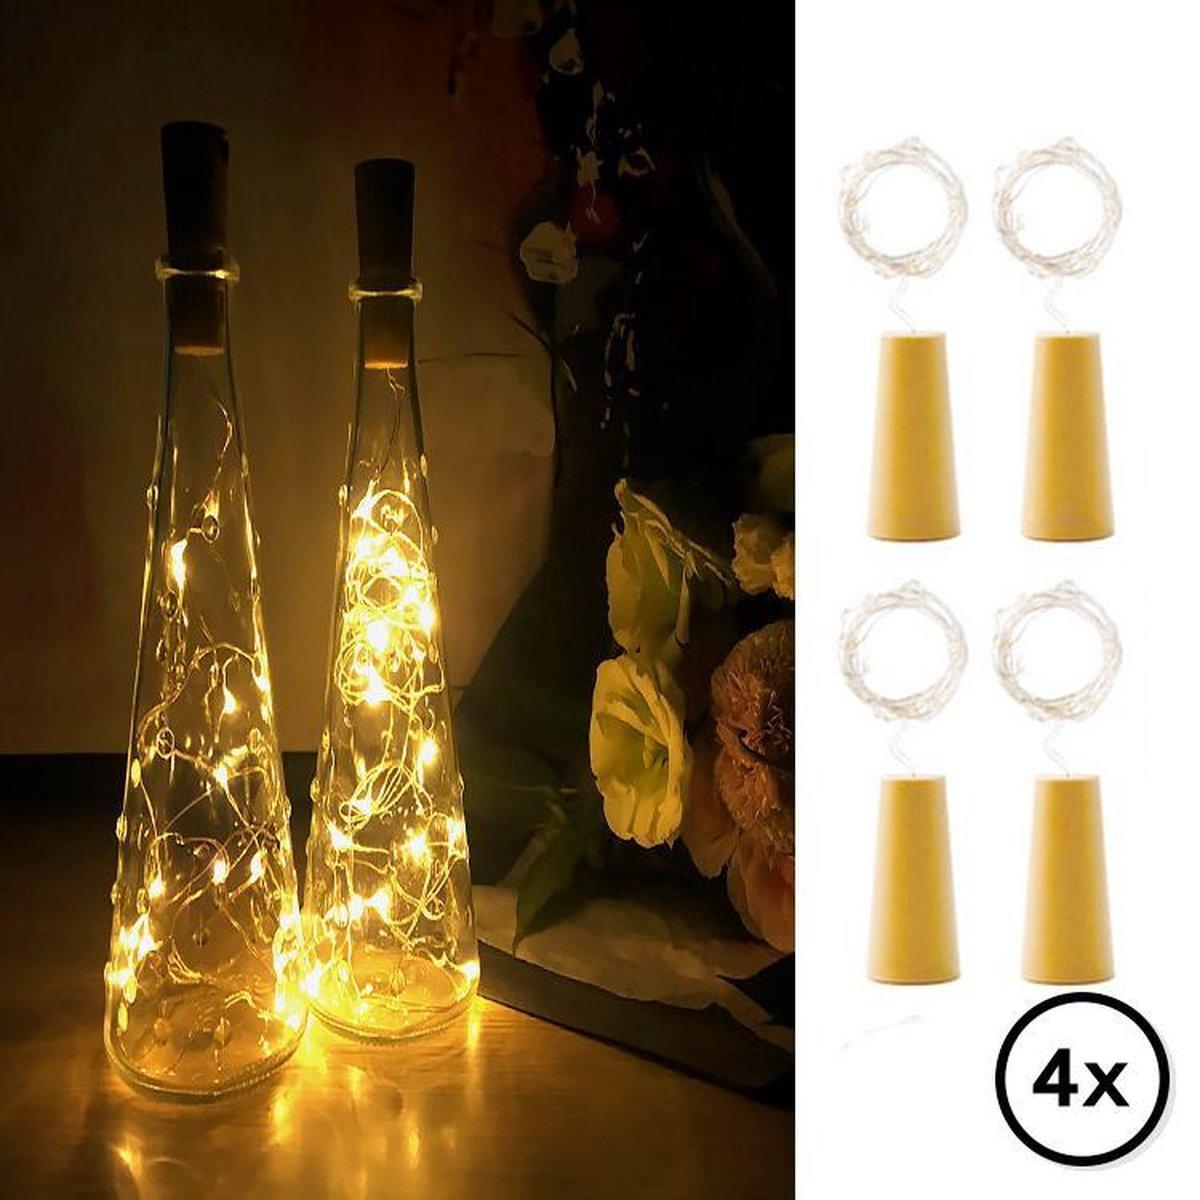 Flesverlichting - Set van 4 incl. Batterijen - Flessenlicht - Kurk verlichting